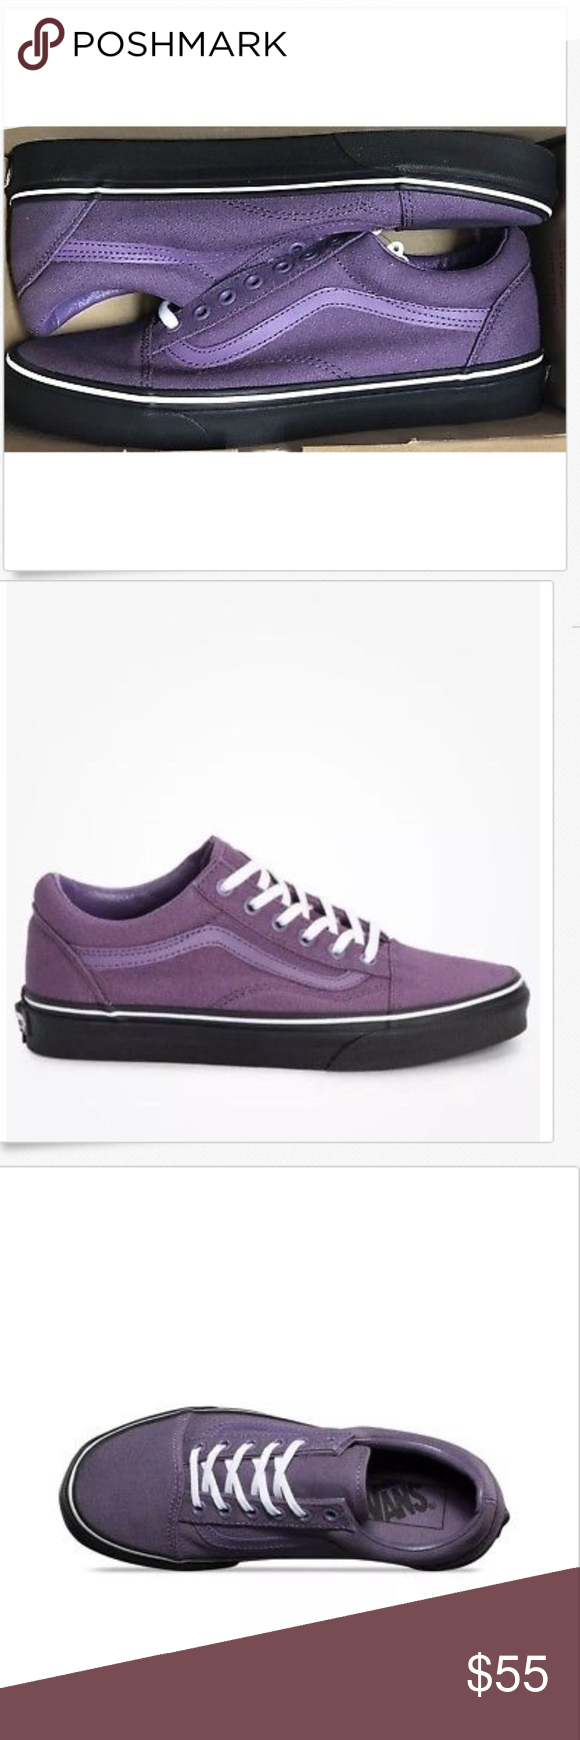 efa6e1a458 Vans Old Skool Black Outsole Montana Grape Shoes🌹 Vans Old Skool Black  Outsole Montana Grape Shoes Size Men 9 Women 10.5 Brand new in box Vans  Shoes ...